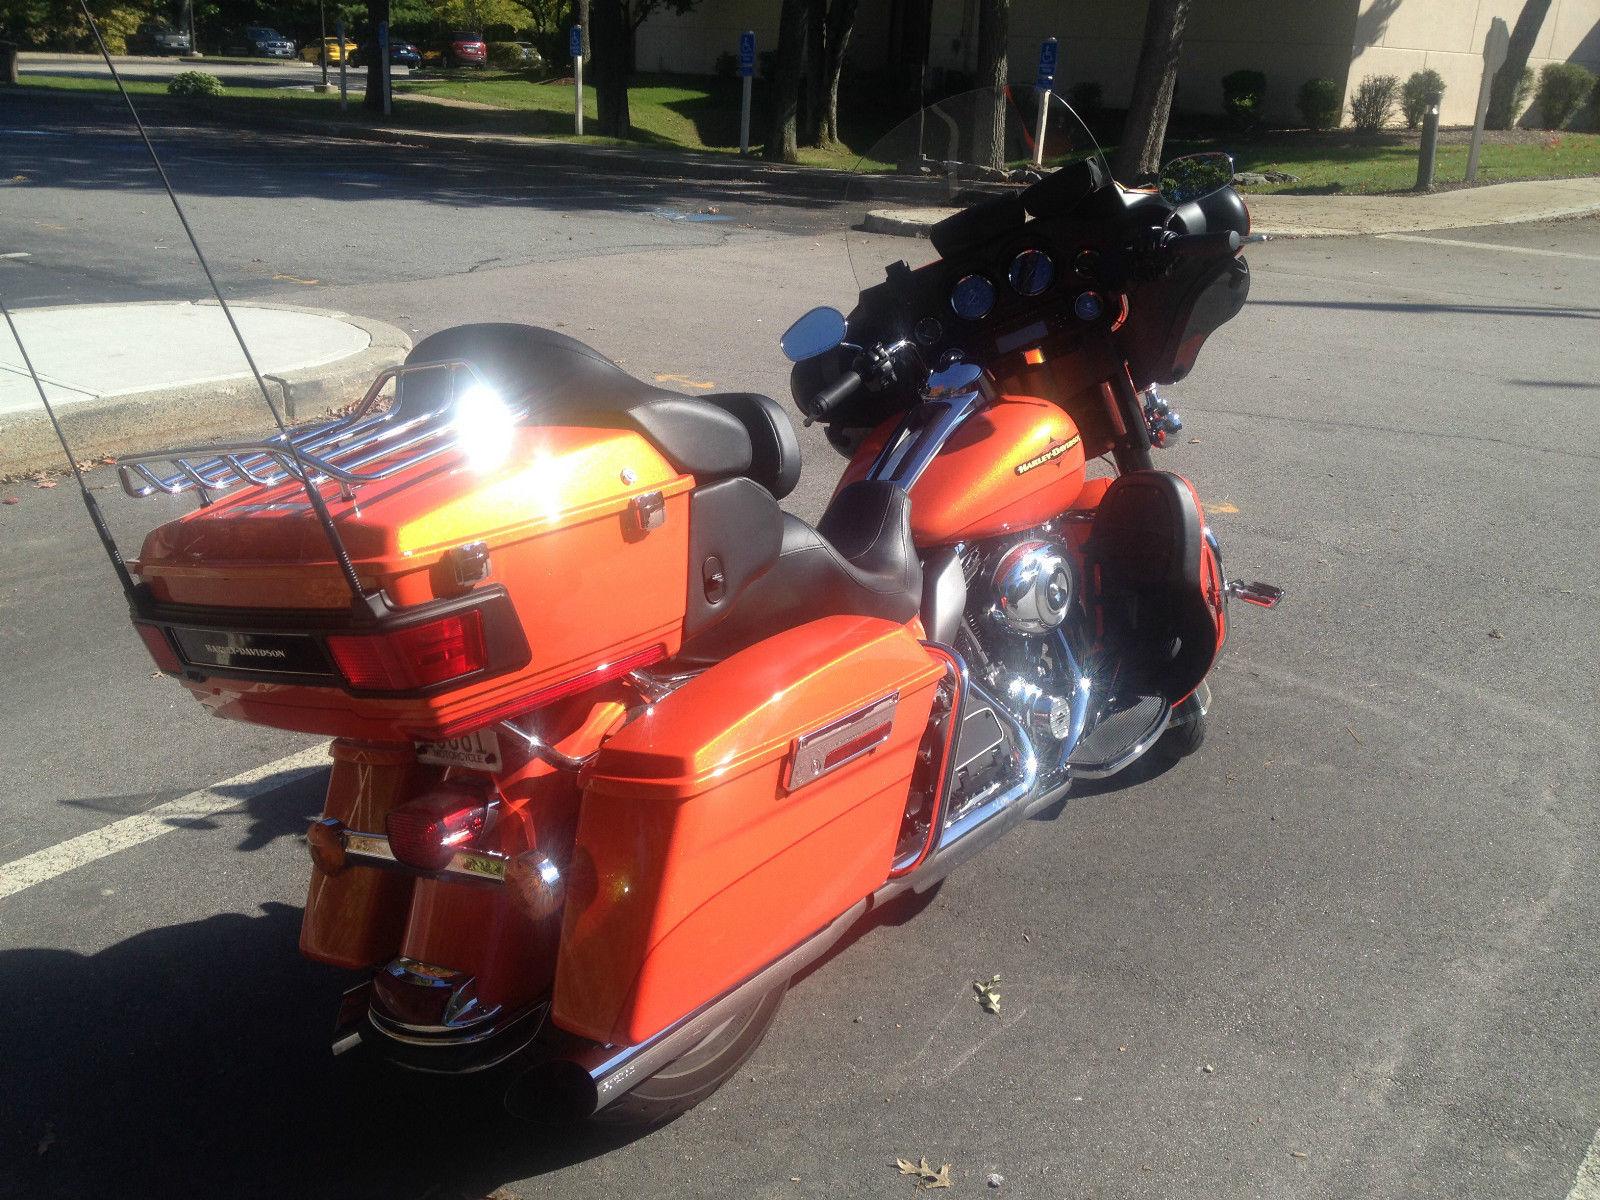 Harley Davidson Electra Glide Ultra Limited Tequila Sunrise